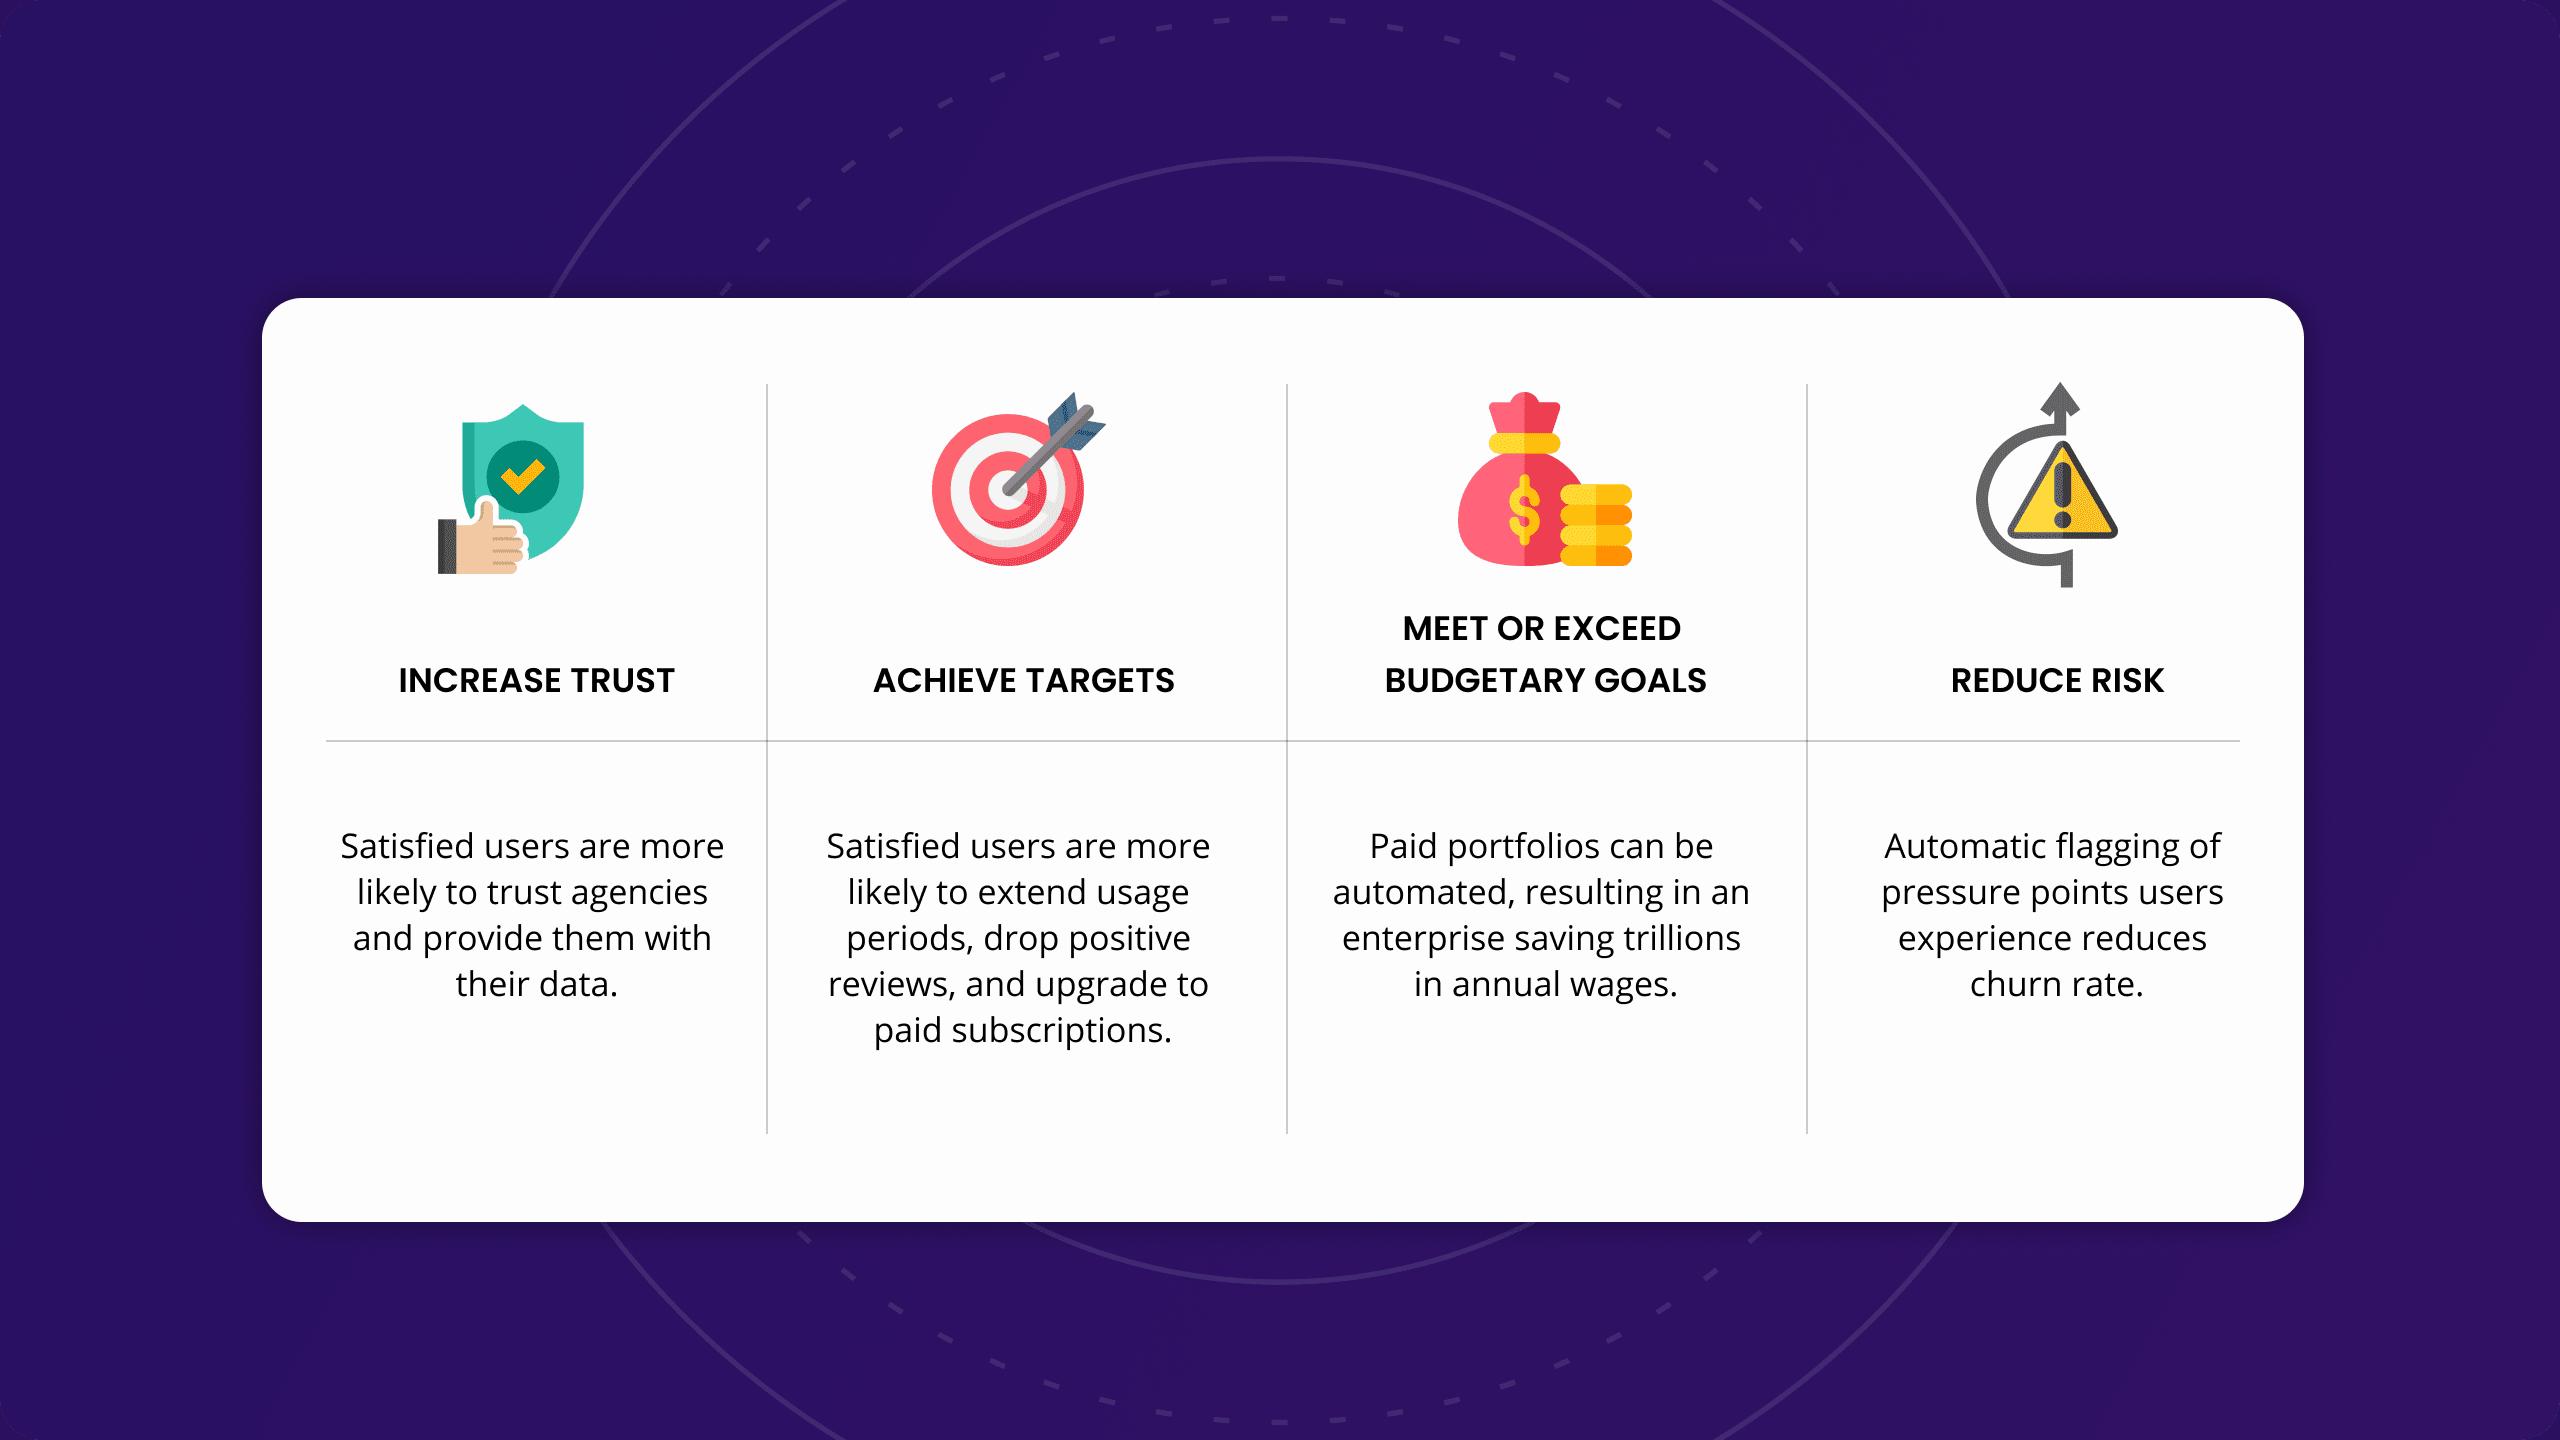 Benefits of Data Automation